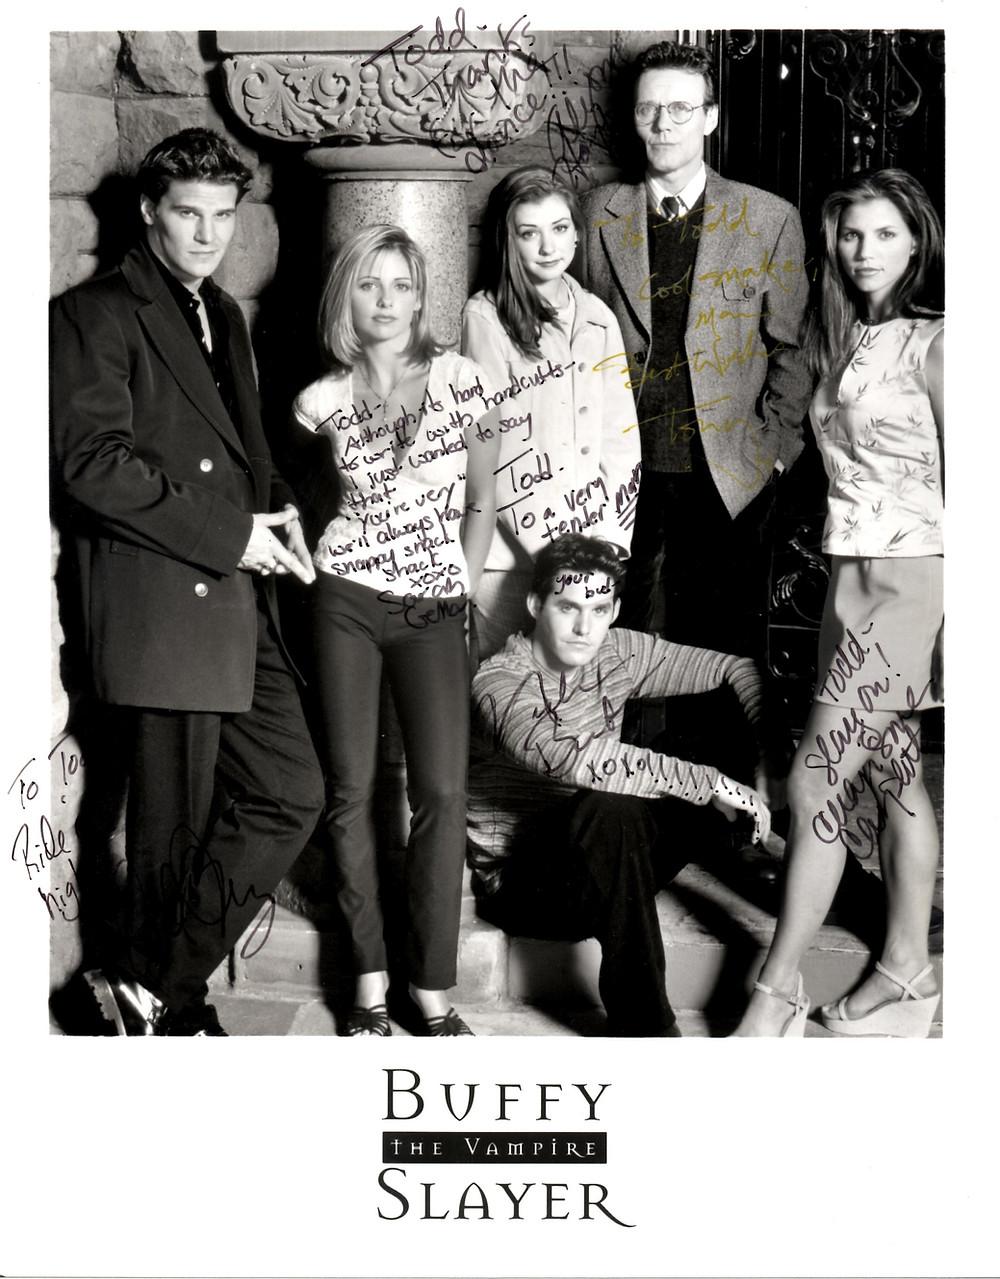 """Buffy the Vampire Slayer"" Todd Babcock"